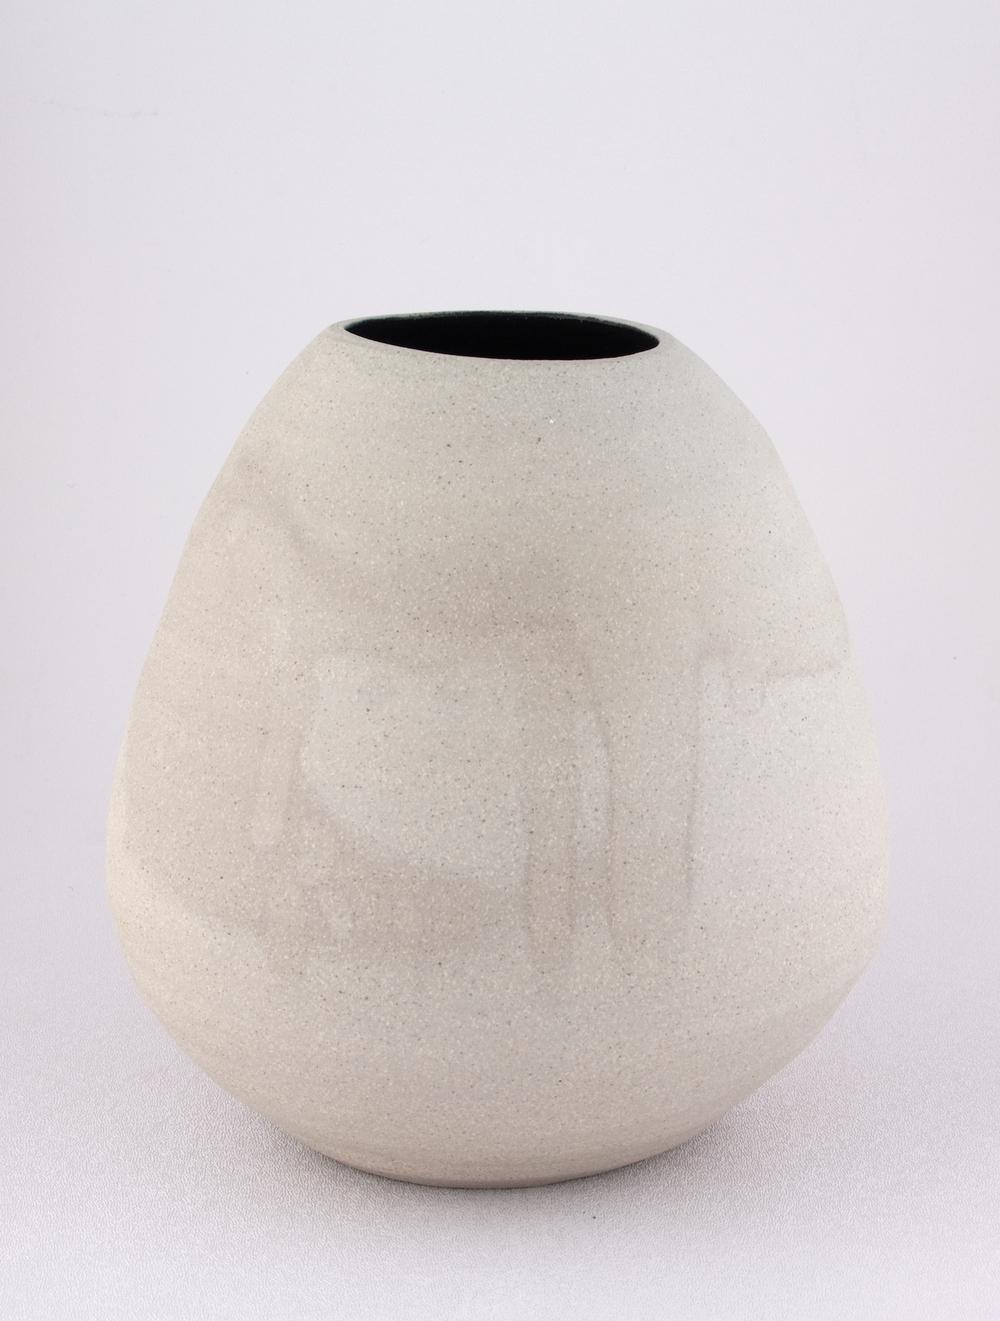 Shio Kusaka  Untitled (grey and black)  2008 Stoneware 8h x 8w x 8d in SK062